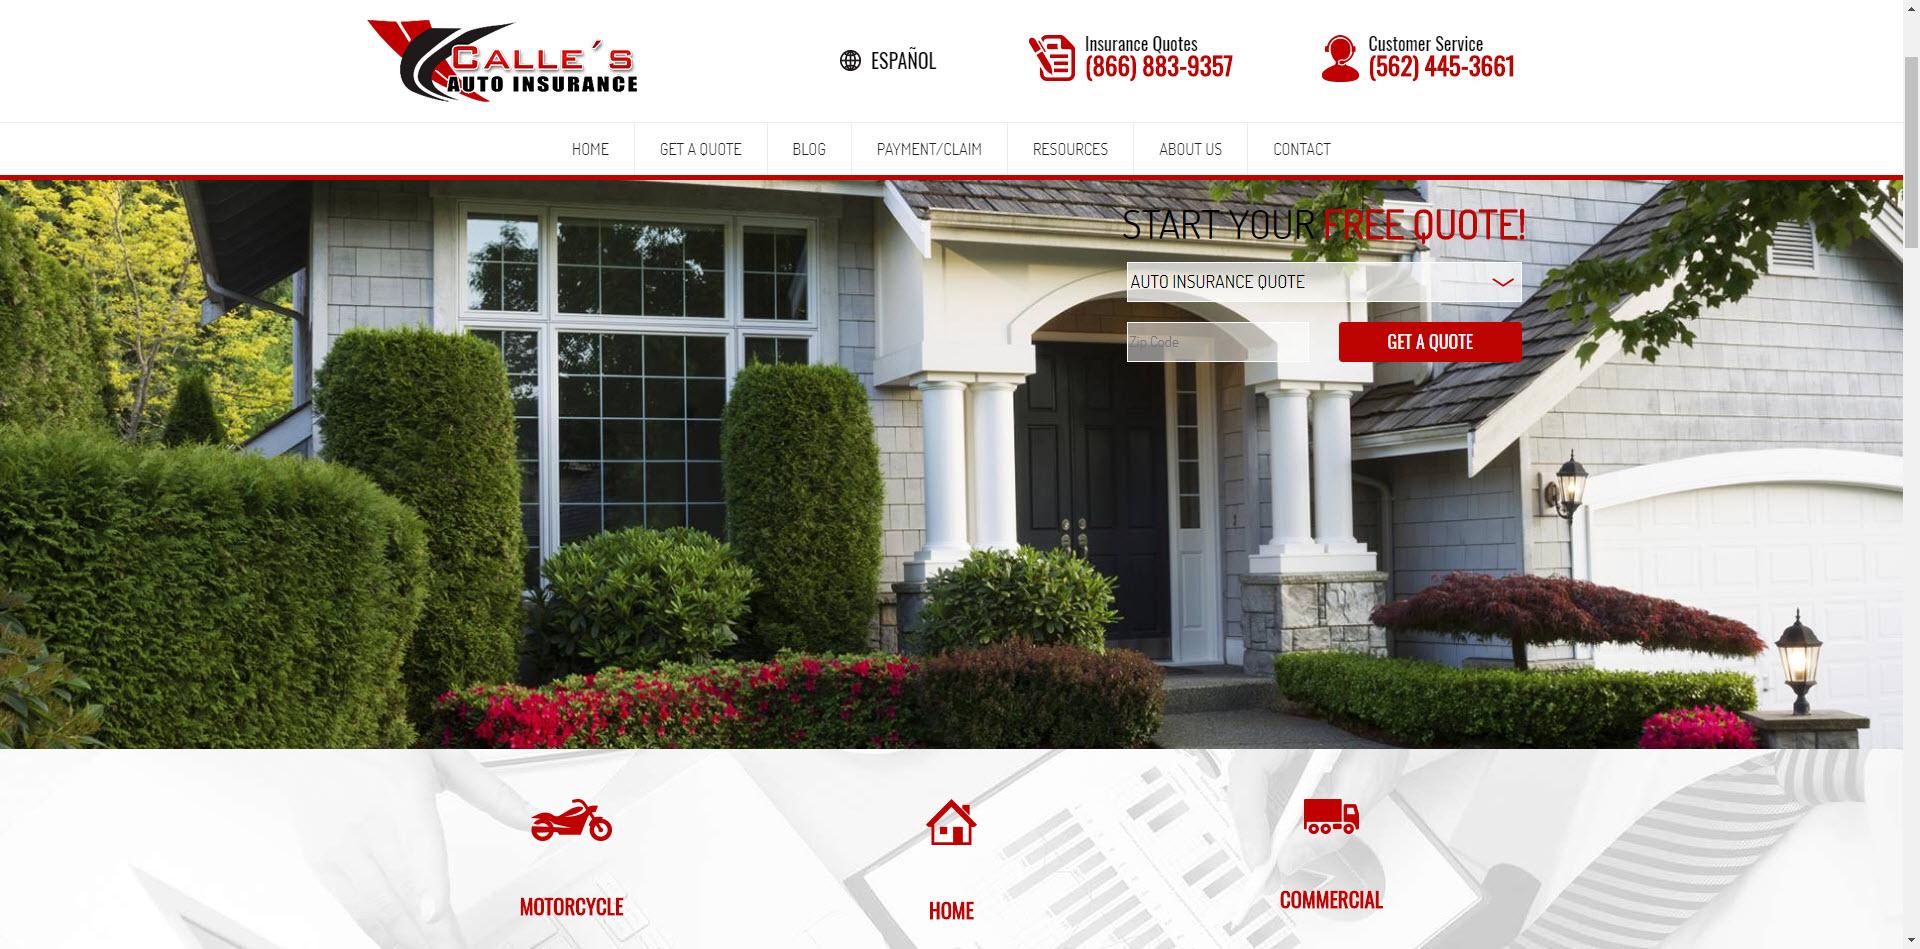 Calles Insurance Services